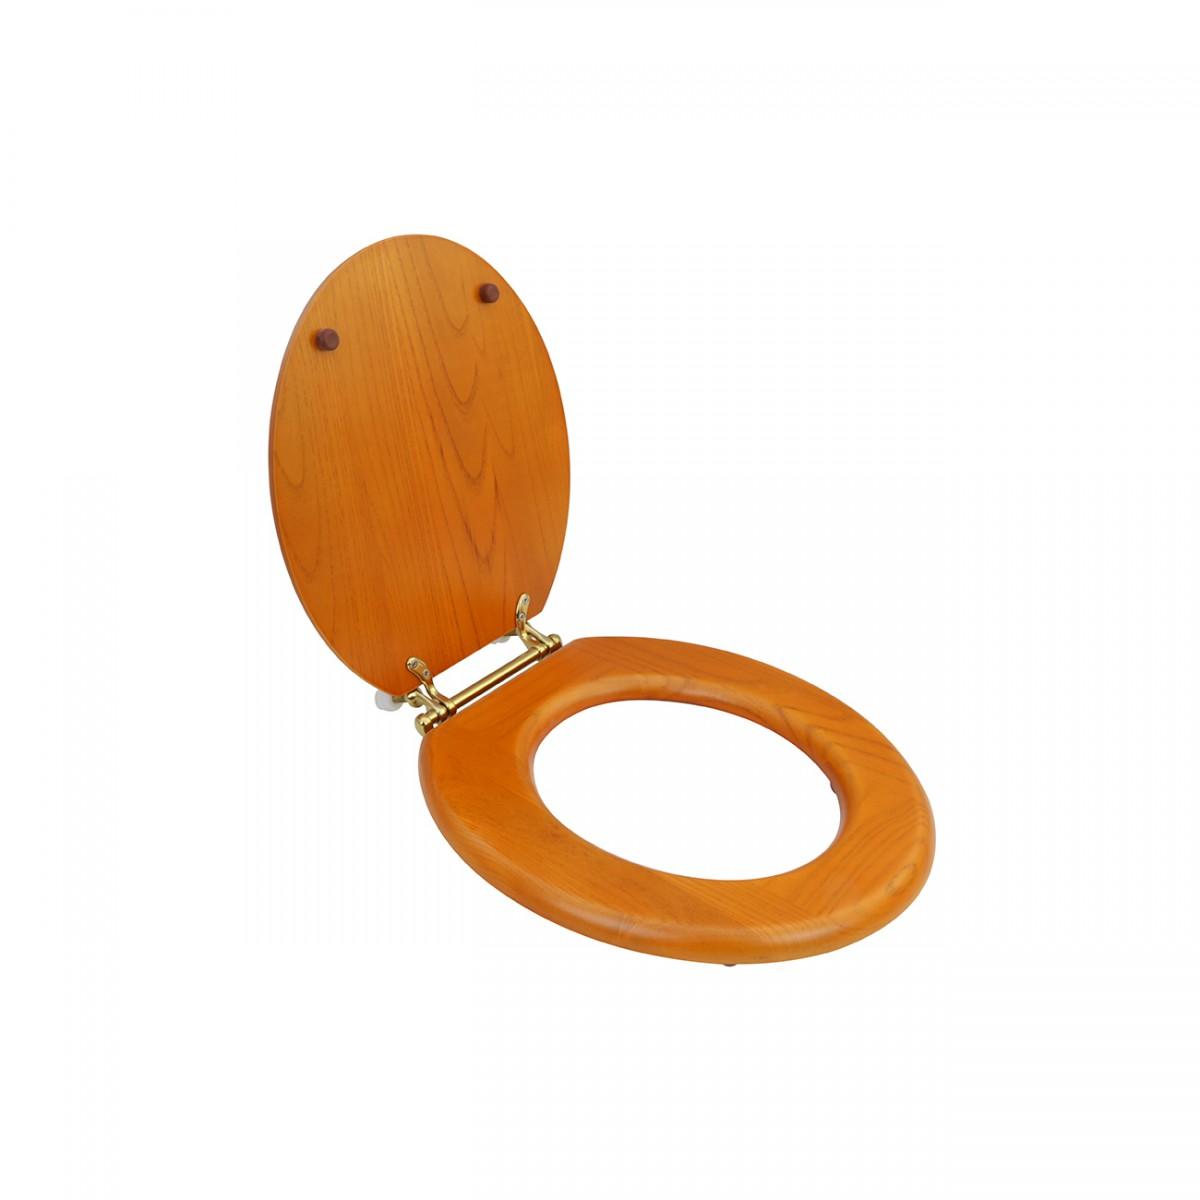 Round Toilet Seat Hardwood Golden Oak Finish Brass Hinge wooden toilet seat Toilet Seat Covers Solid Wood Toilet Seat